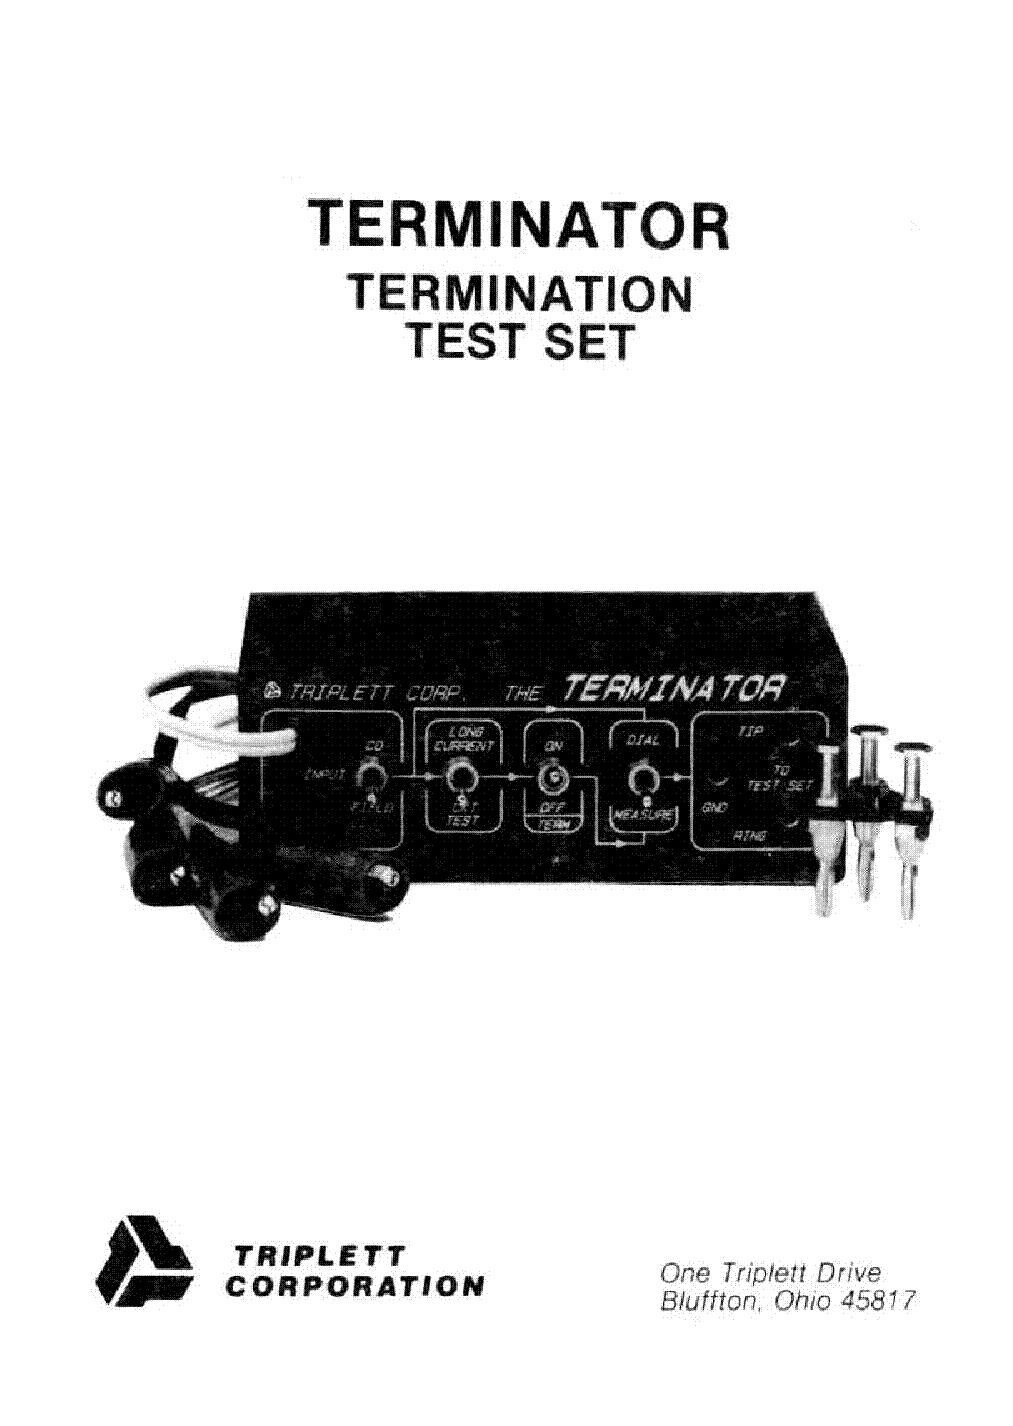 TRIPLETT MODEL-TERMINATOR TERMINATION TEST SET Service Manual ... on terminator specifications, terminator blueprints, terminator screensaver, terminator cpu, terminator robot, terminator models, terminator hunter killer prototype, terminator books, terminator figures,